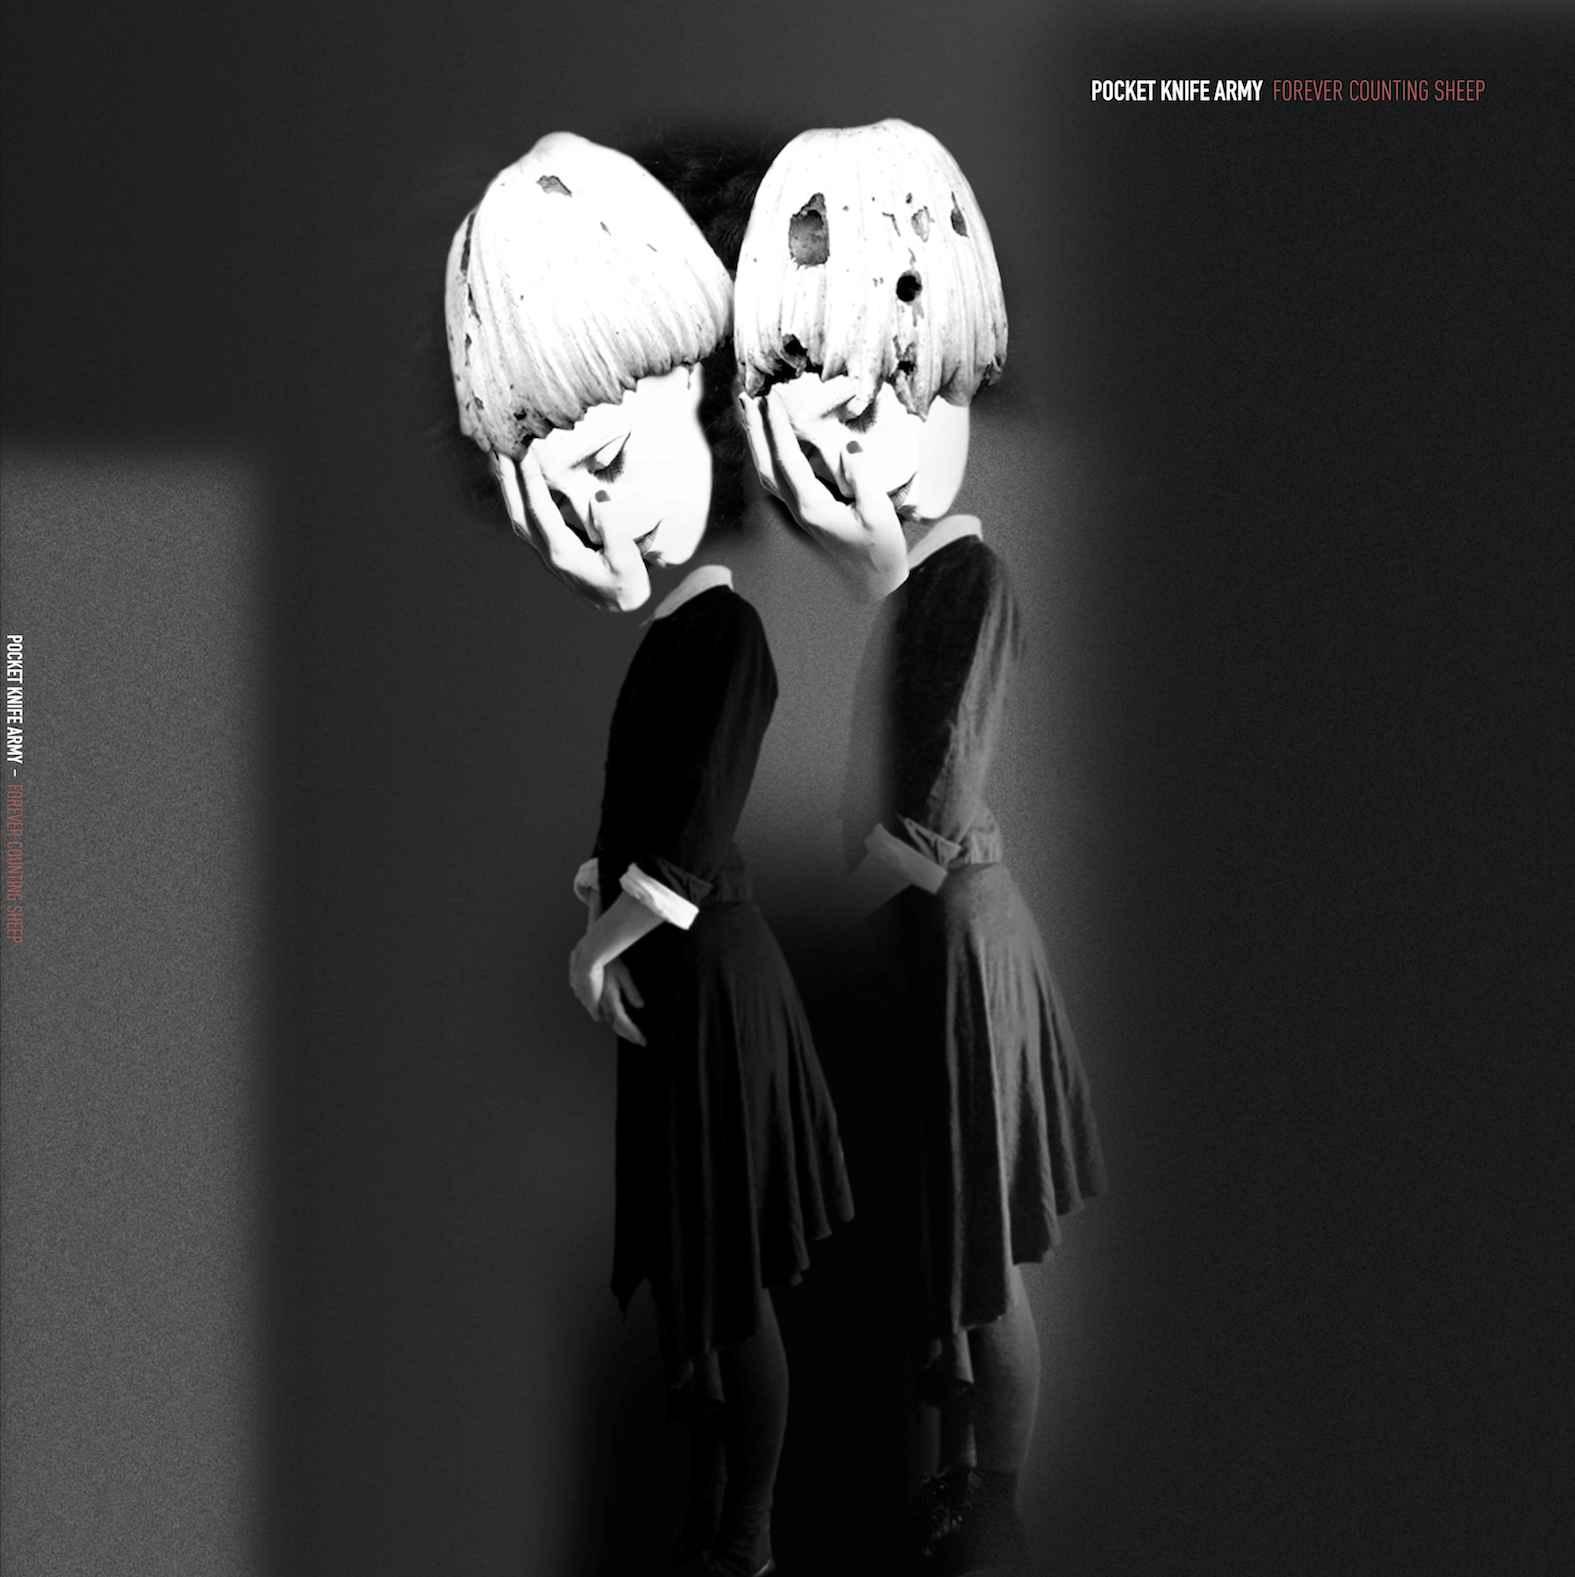 Forever Counting Sheep - Vinyl / CD - Beautiful gatefold edition, 180 grams vinyl. Download code included! - Or CD Digipack€14,95 - CD€20,95 - Vinyl